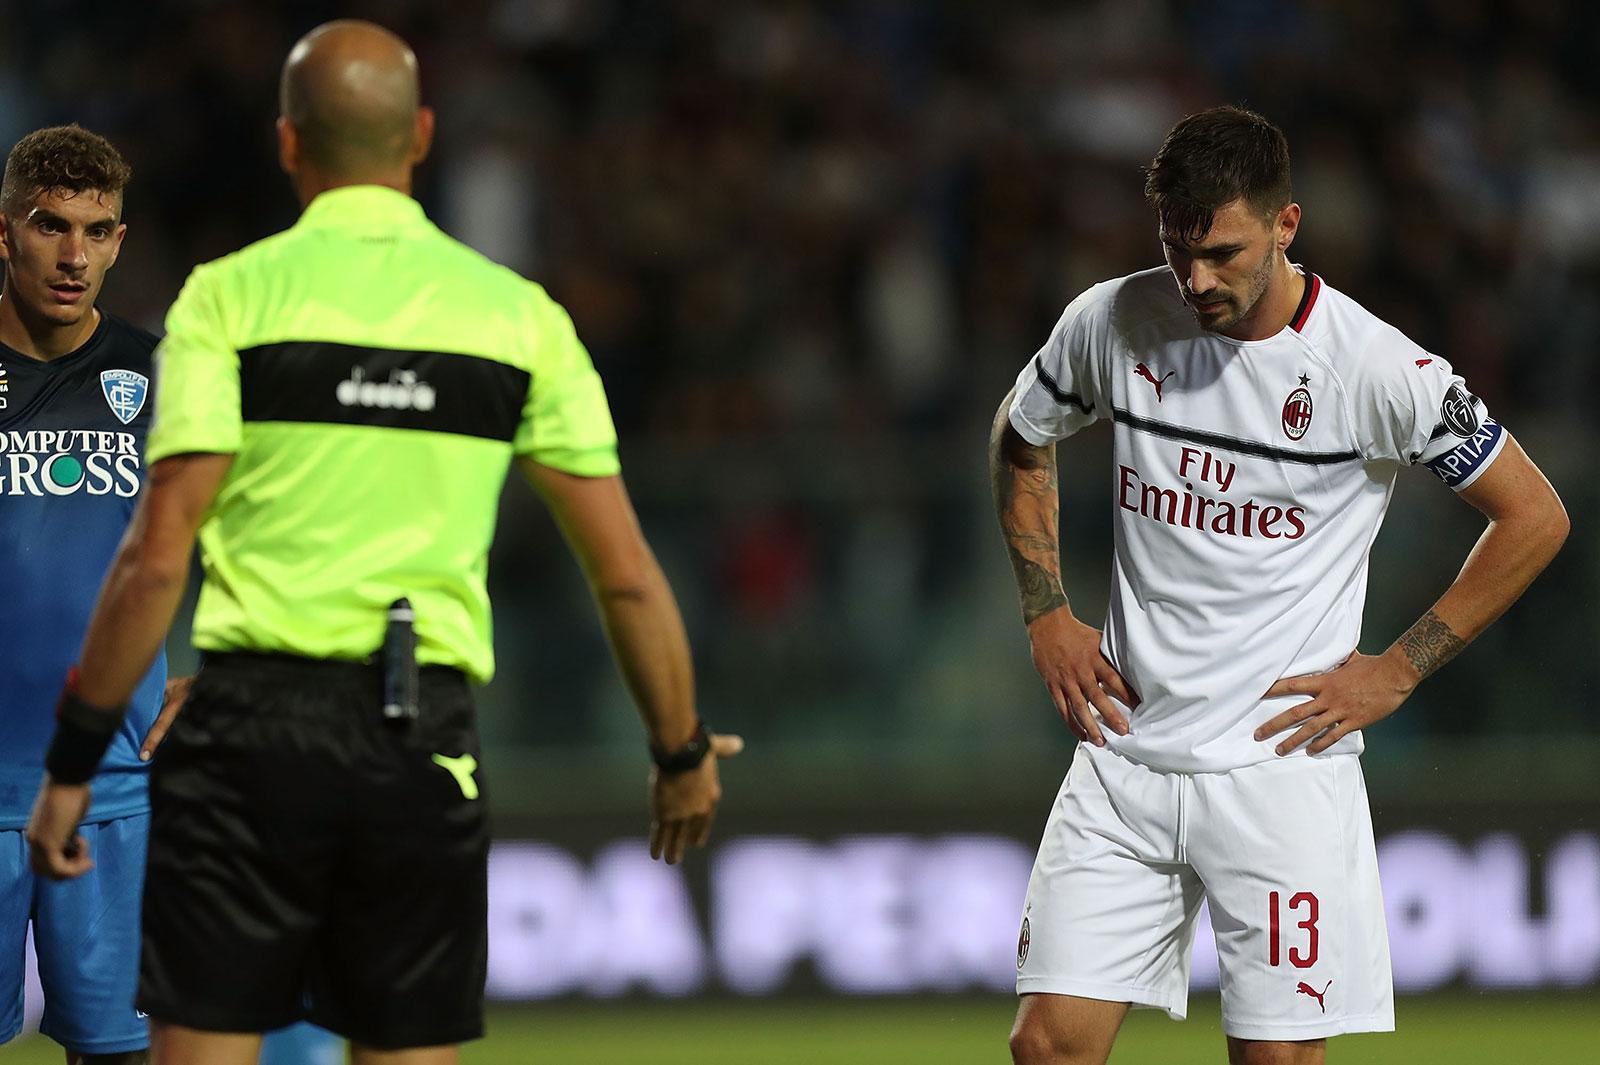 Alessio Romagnoli during Empoli-Milan at Stadio Carlo Castellani on September 27, 2018. (Photo by Gabriele Maltinti/Getty Images)